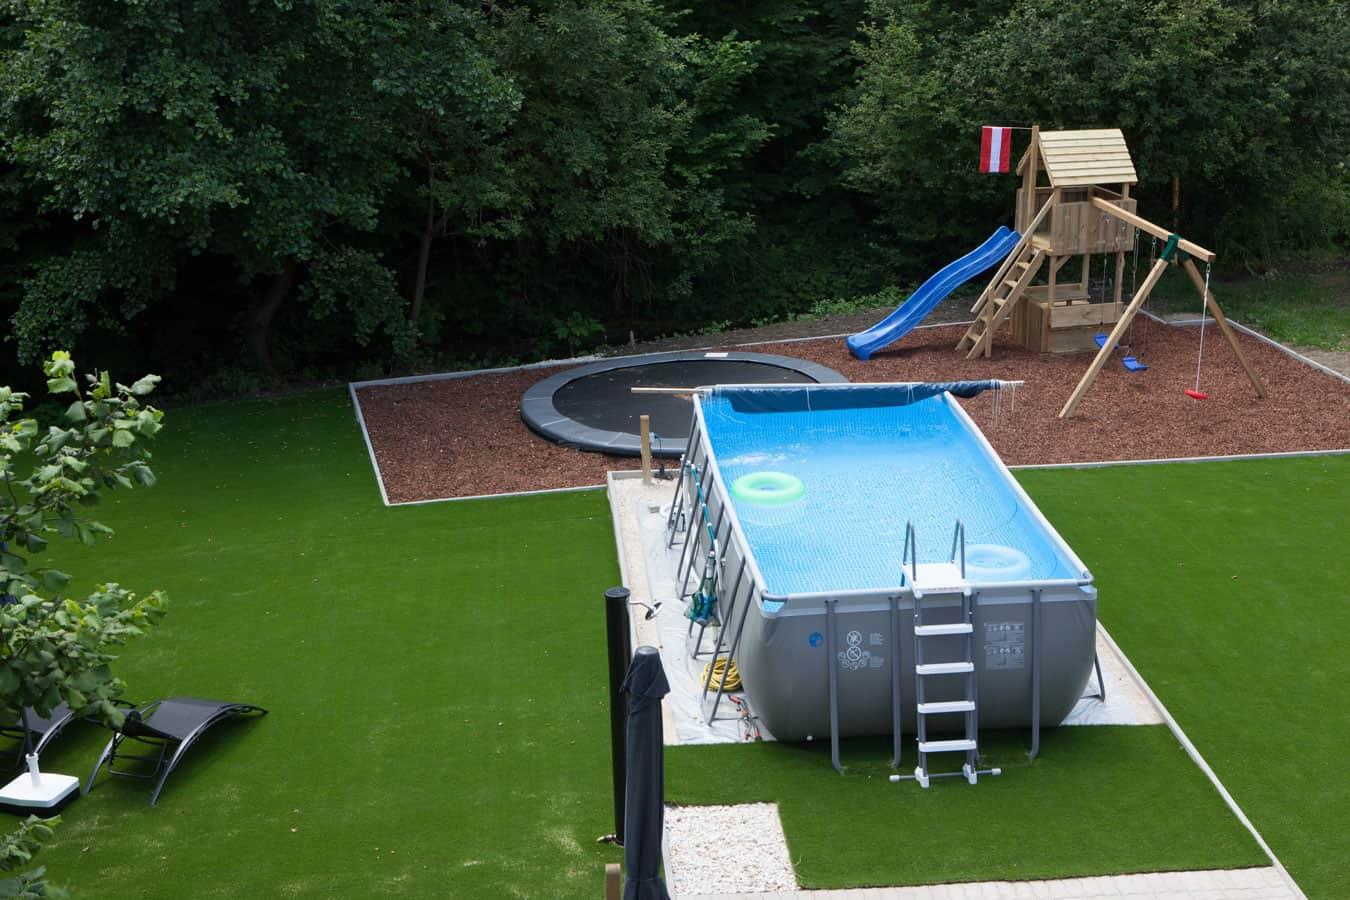 kwo-villa-villa-gluck-auf-1-en-2-zwembad-trampoline-en-speeltoestel